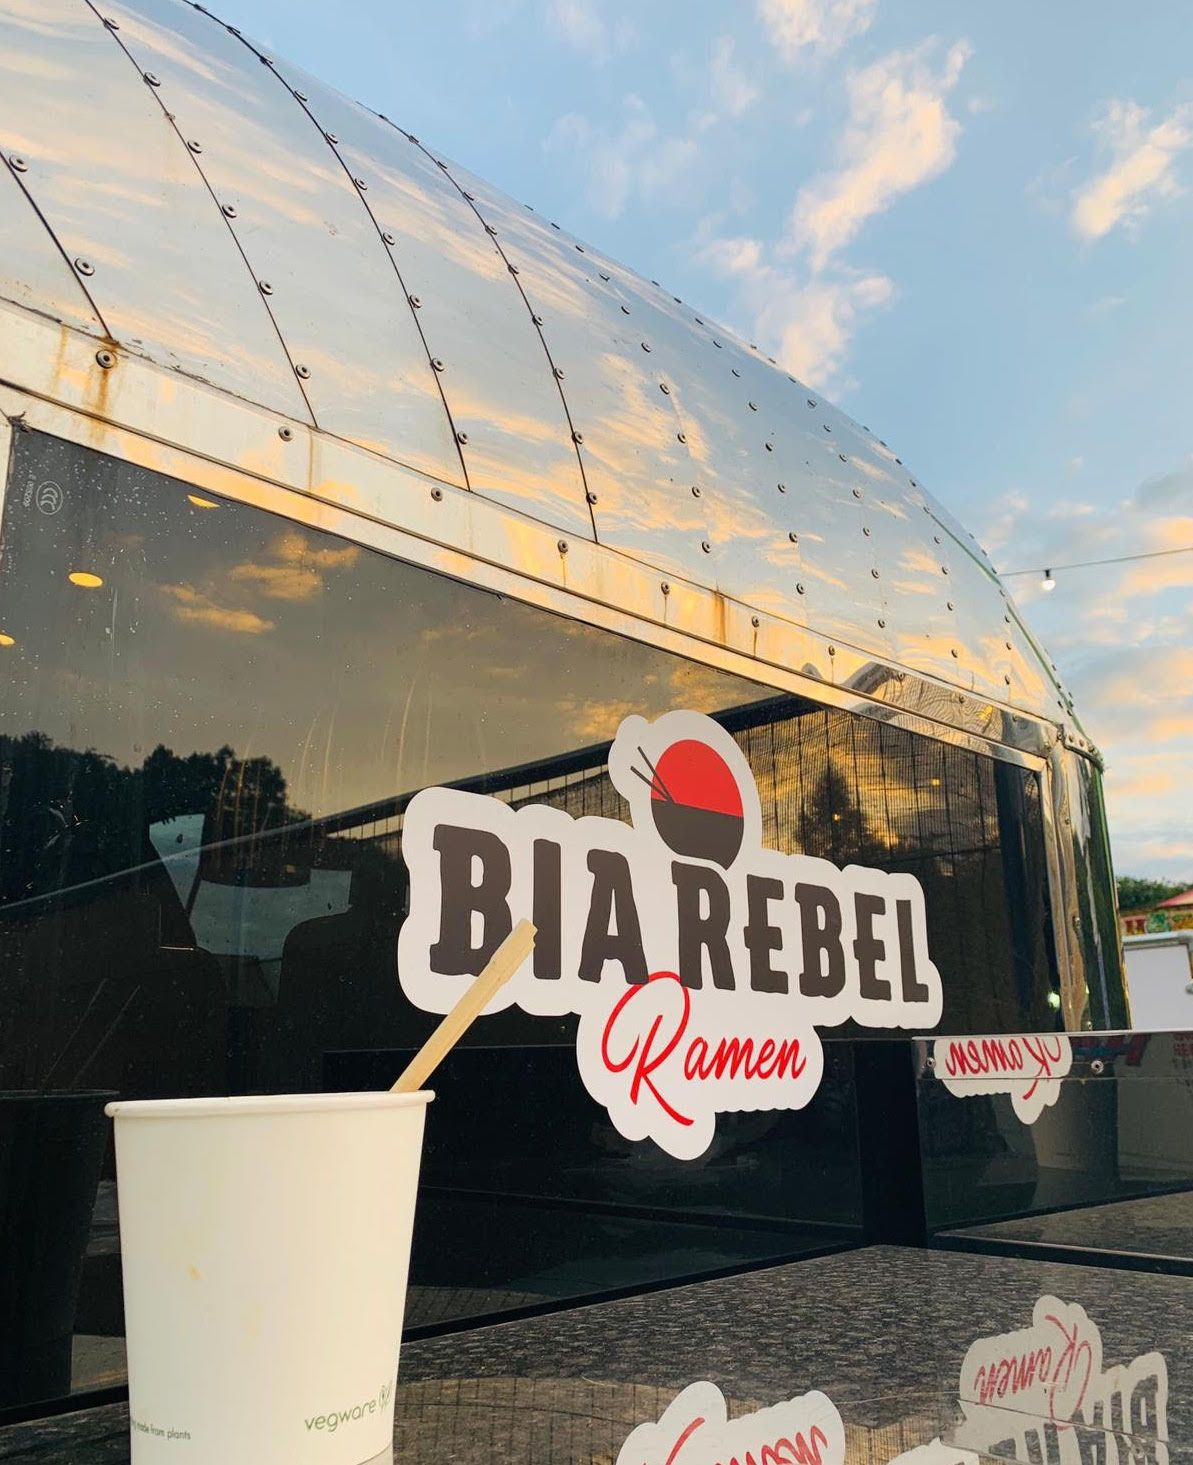 The Bia Rebel Airstream